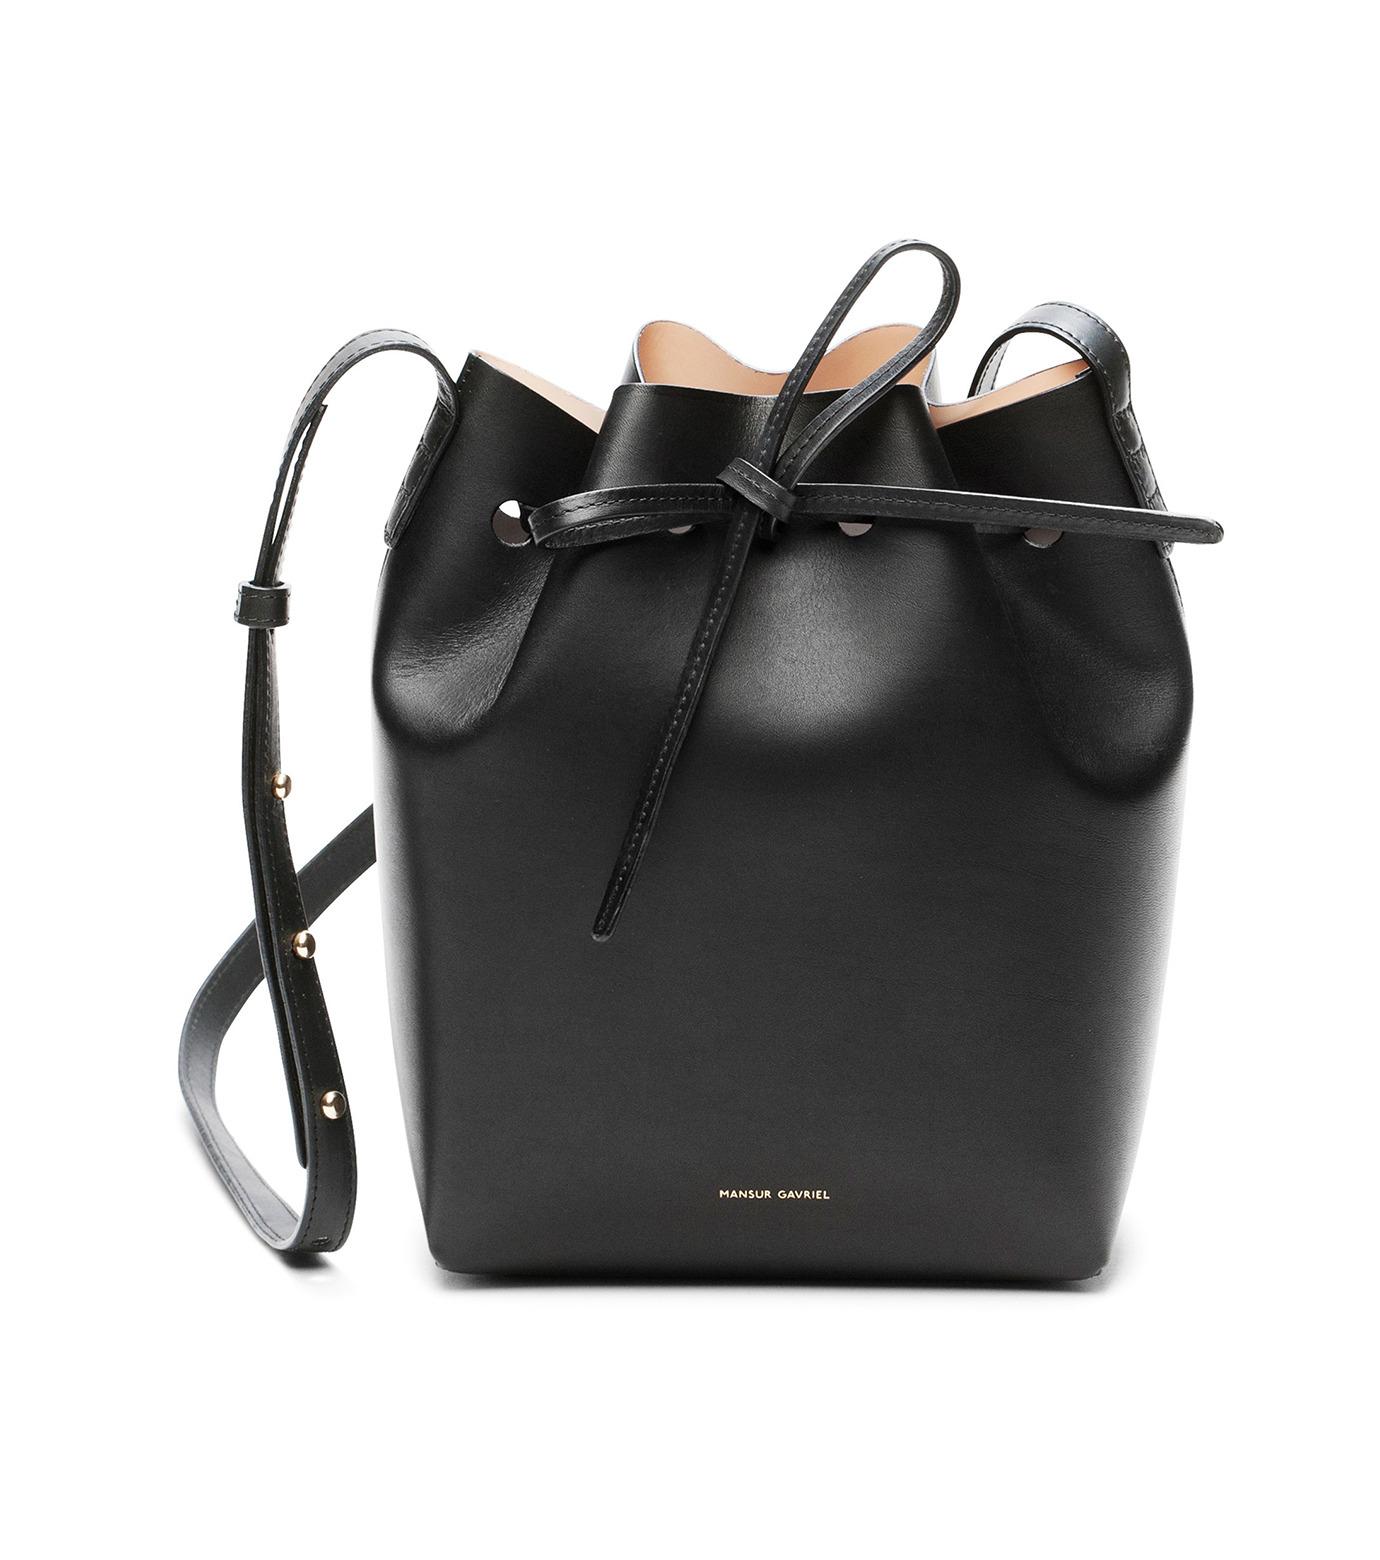 Mansur Gavriel(マンサーガブリエル)のmini bucket bag-BLACK(ショルダーバッグ/shoulder bag)-HMB004VC-13 拡大詳細画像1